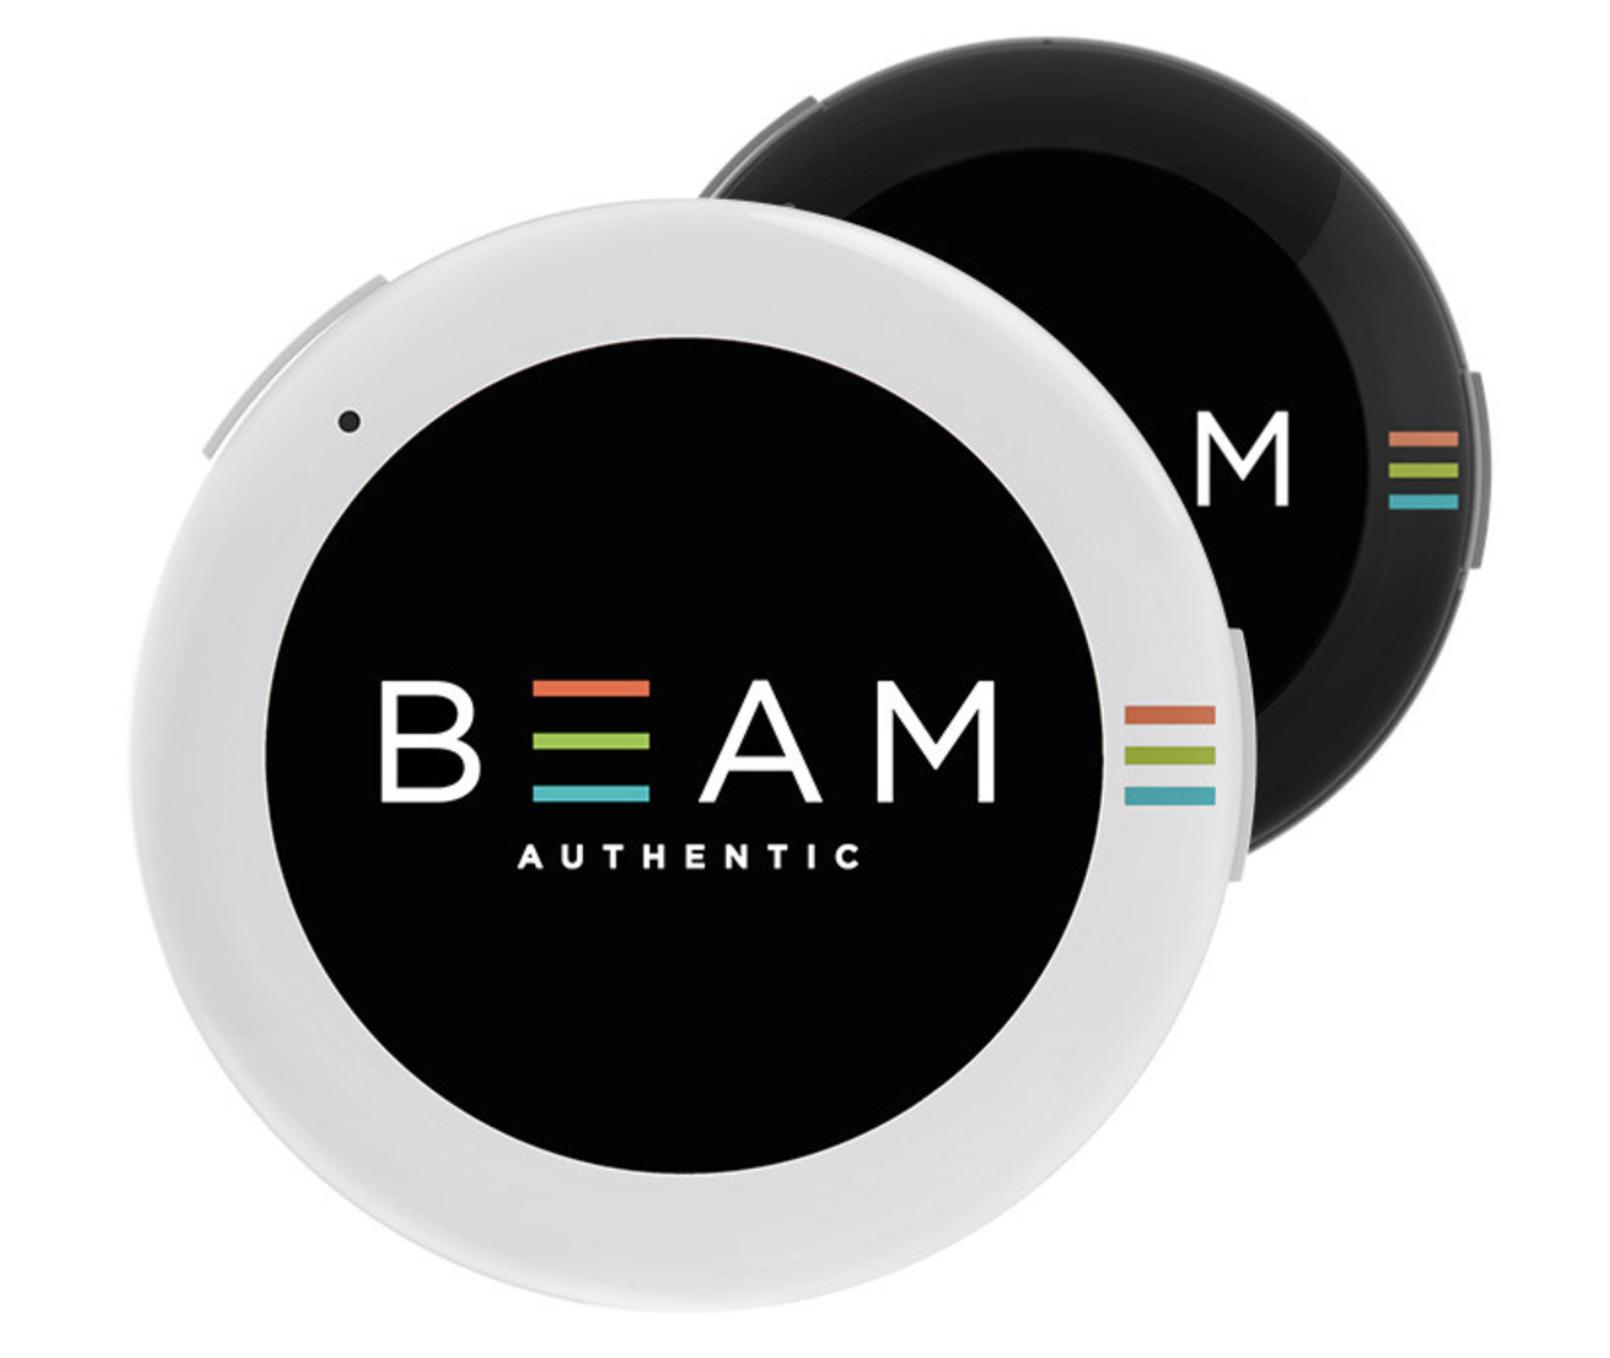 BEAM este un buton smart AMOLED pe care il poti purta